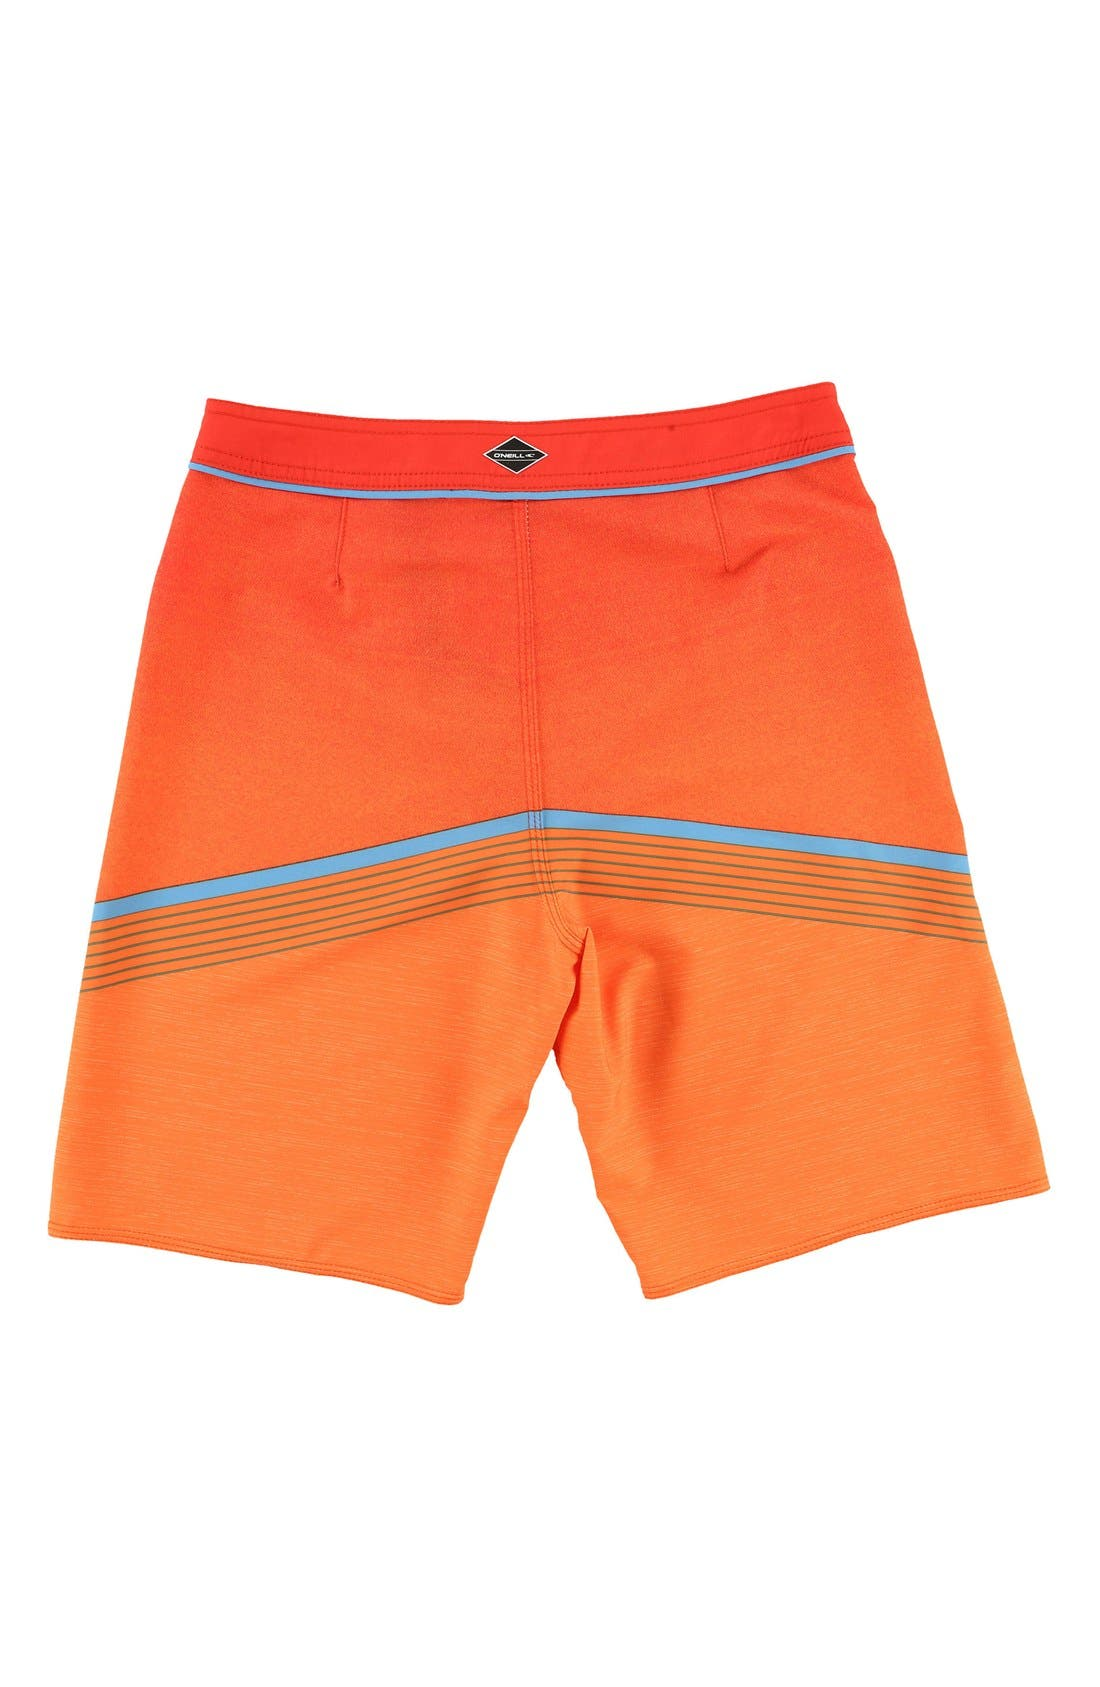 Hyperfreak Stretch Board Shorts,                             Alternate thumbnail 10, color,